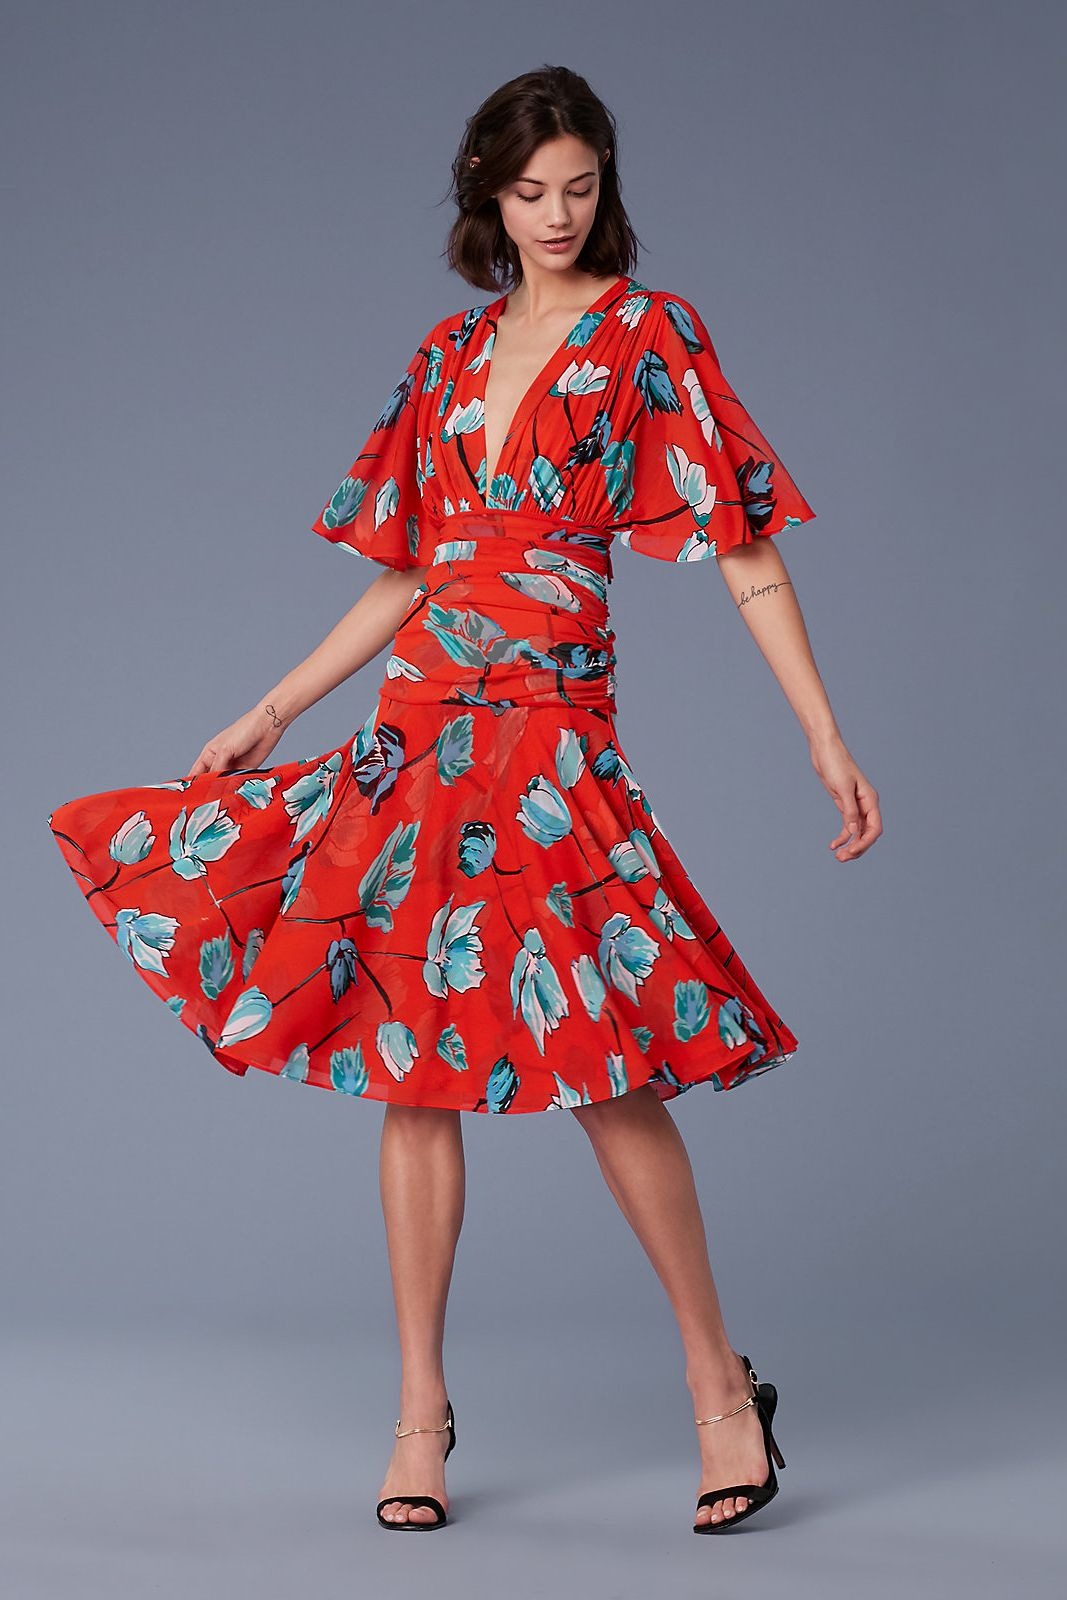 The DVF Asher Mesh Dress